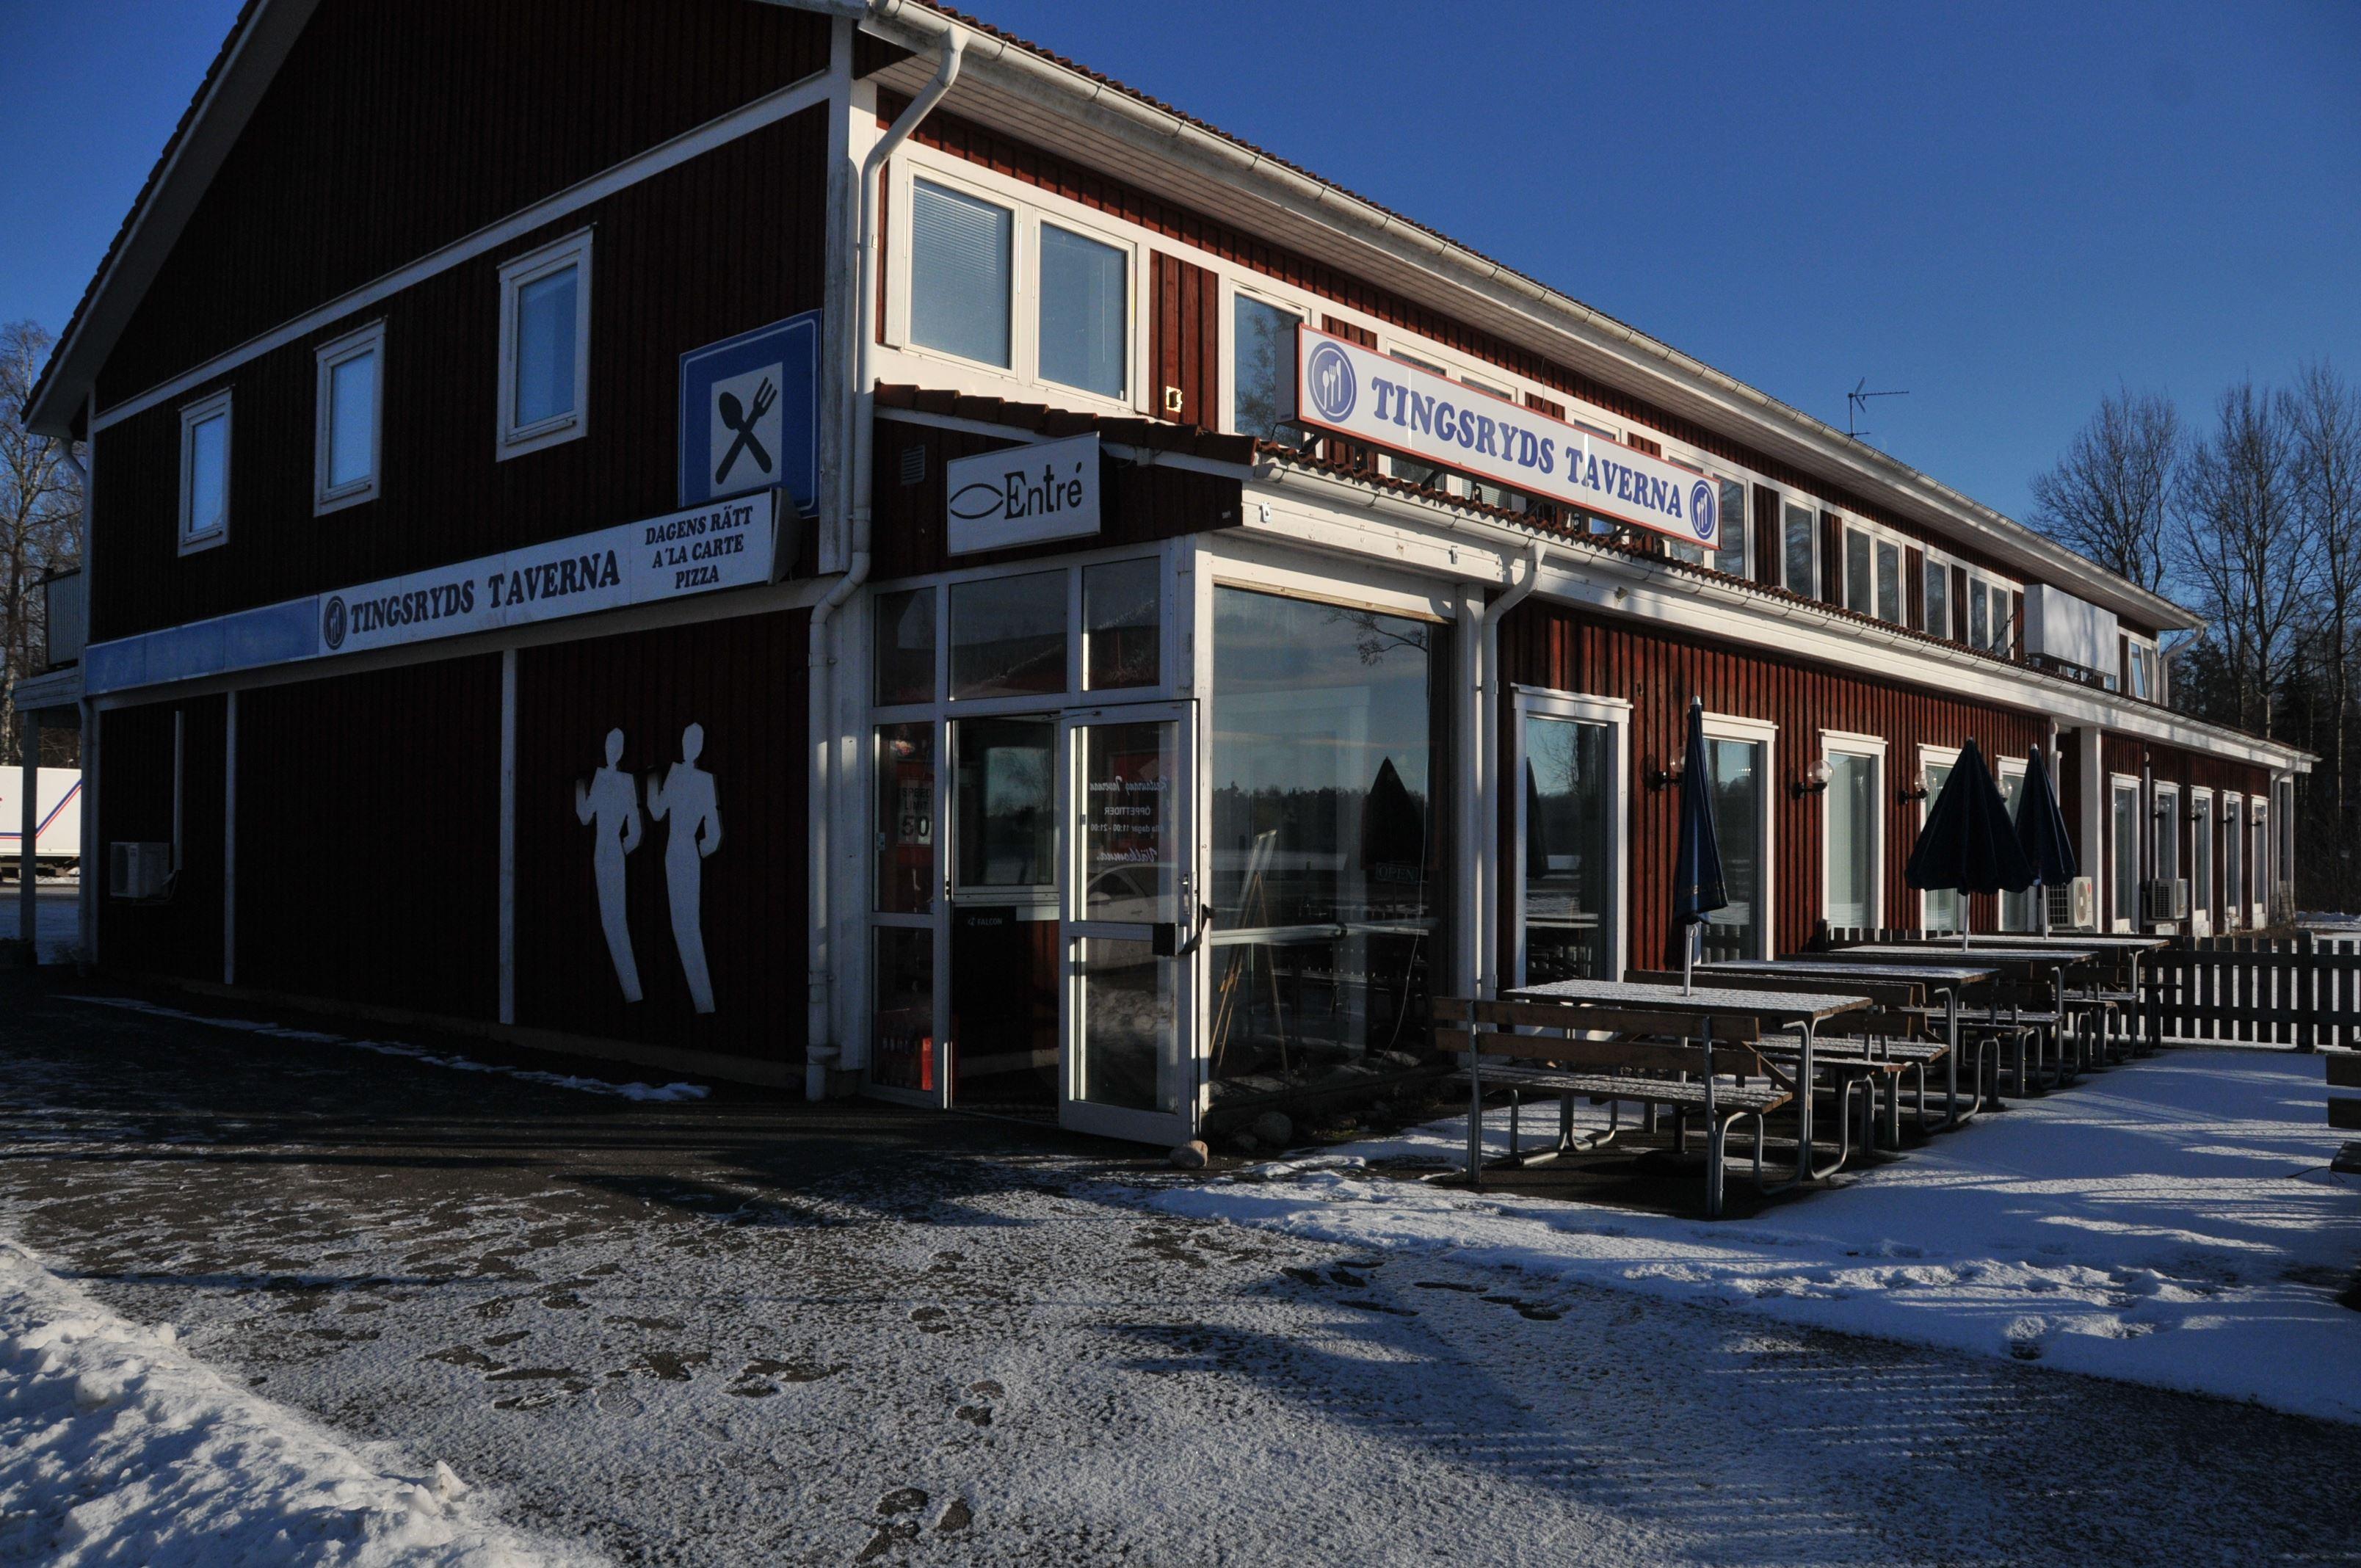 Sebastian Bocaciu, Tingsryds Taverne Stop Inn